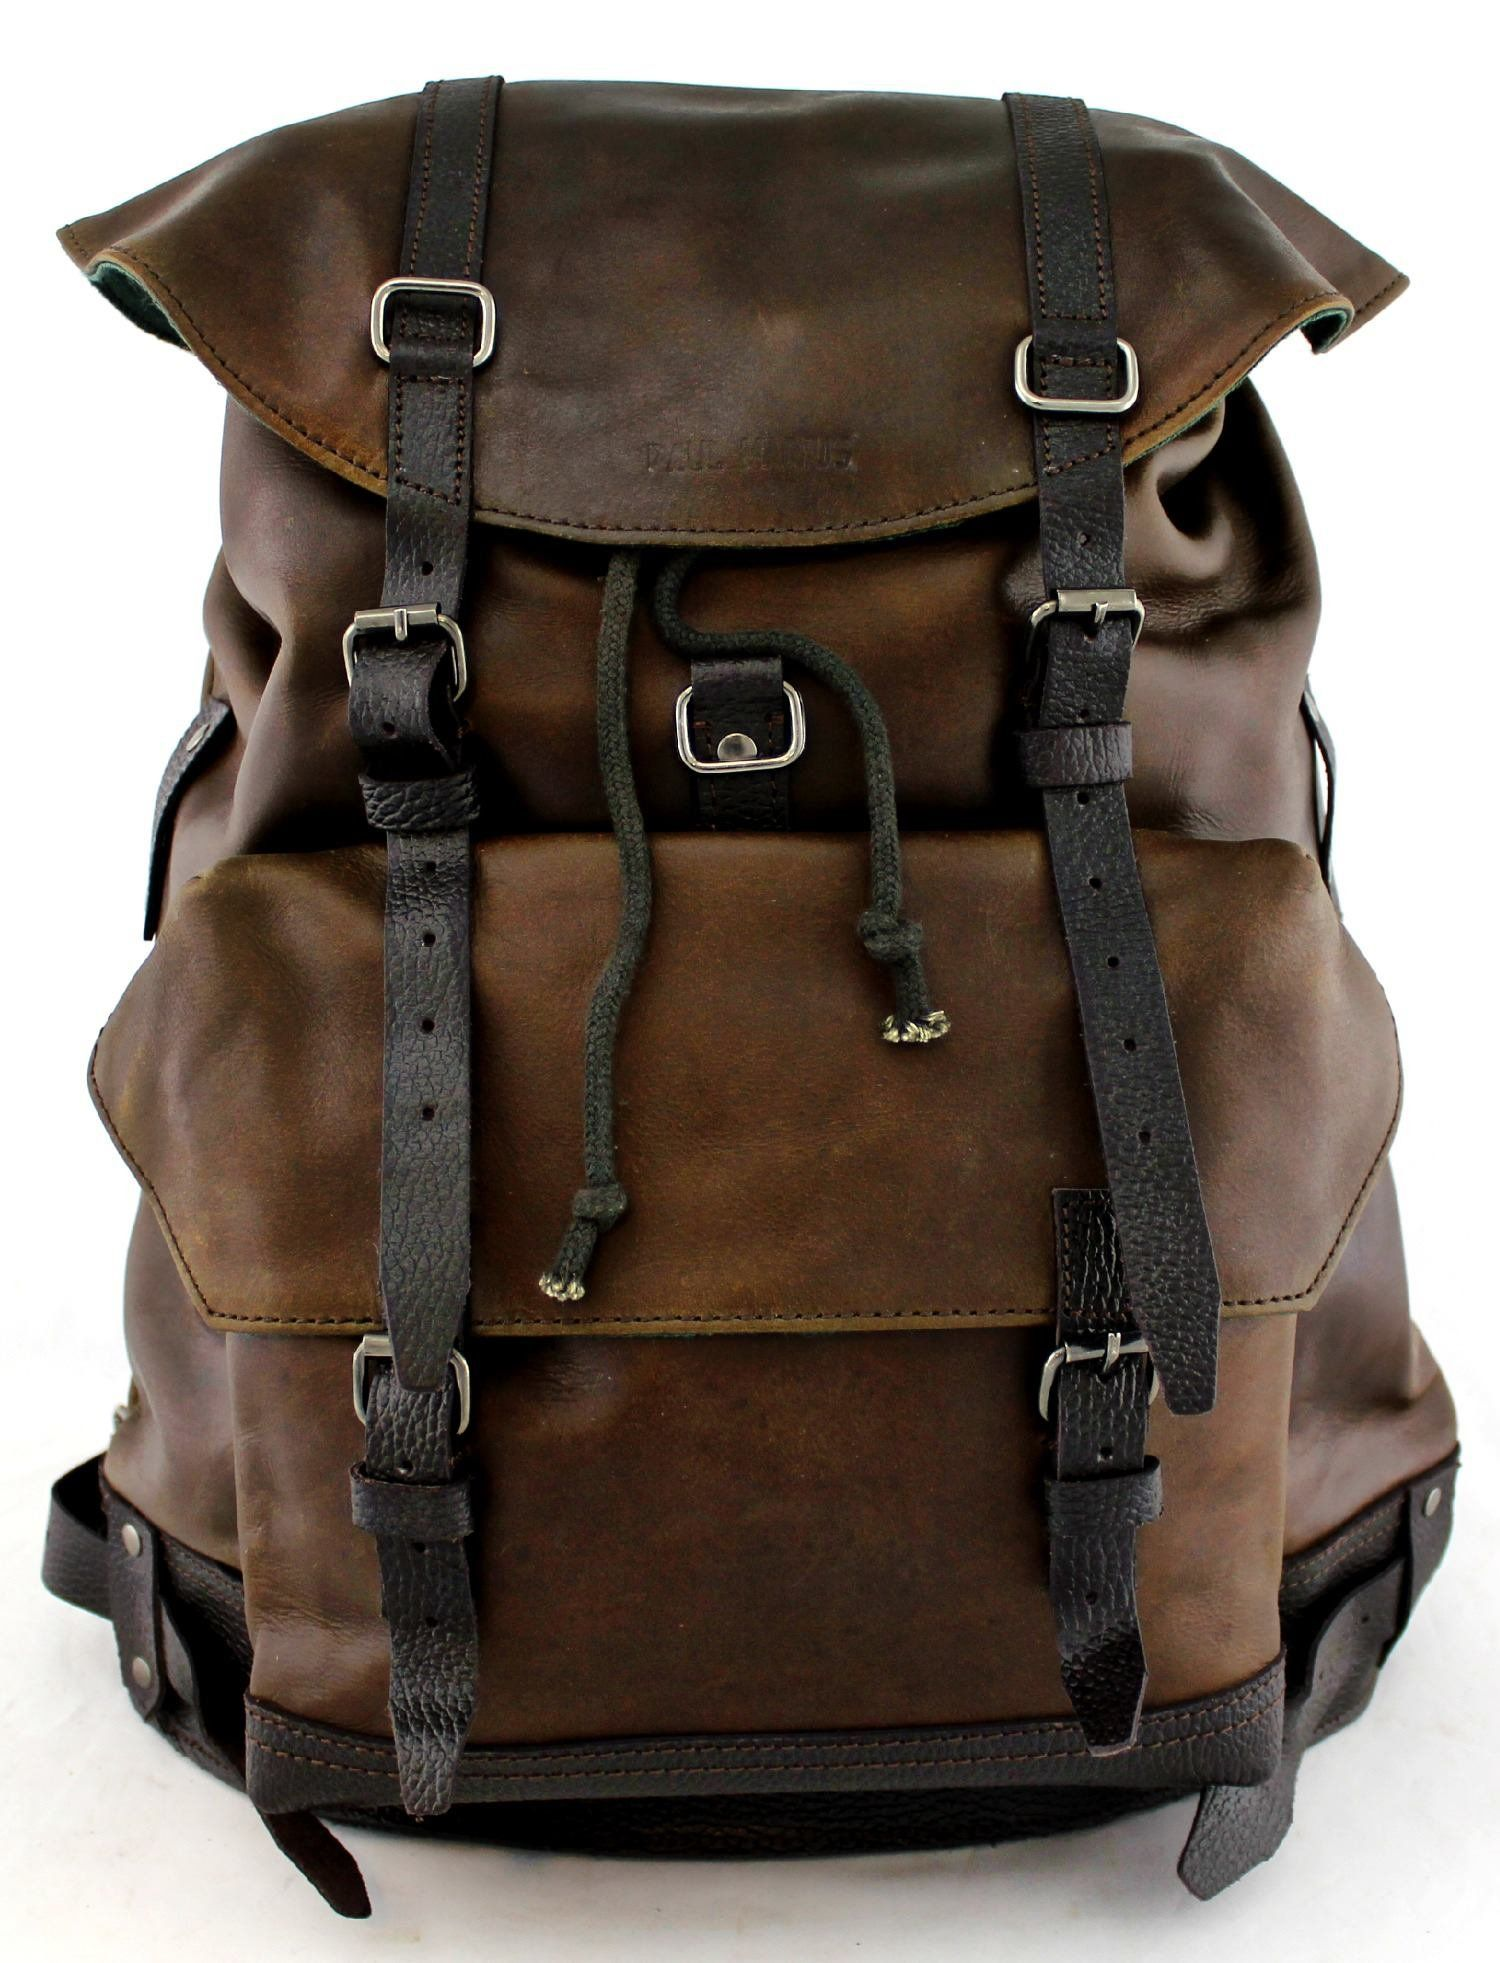 431269c350e5 PAUL MARIUS Rucksack knapsack Reisetasche Vintage-leder Alter Schwarz MON  LEGIONNAIRE Leather Bag Vintage,